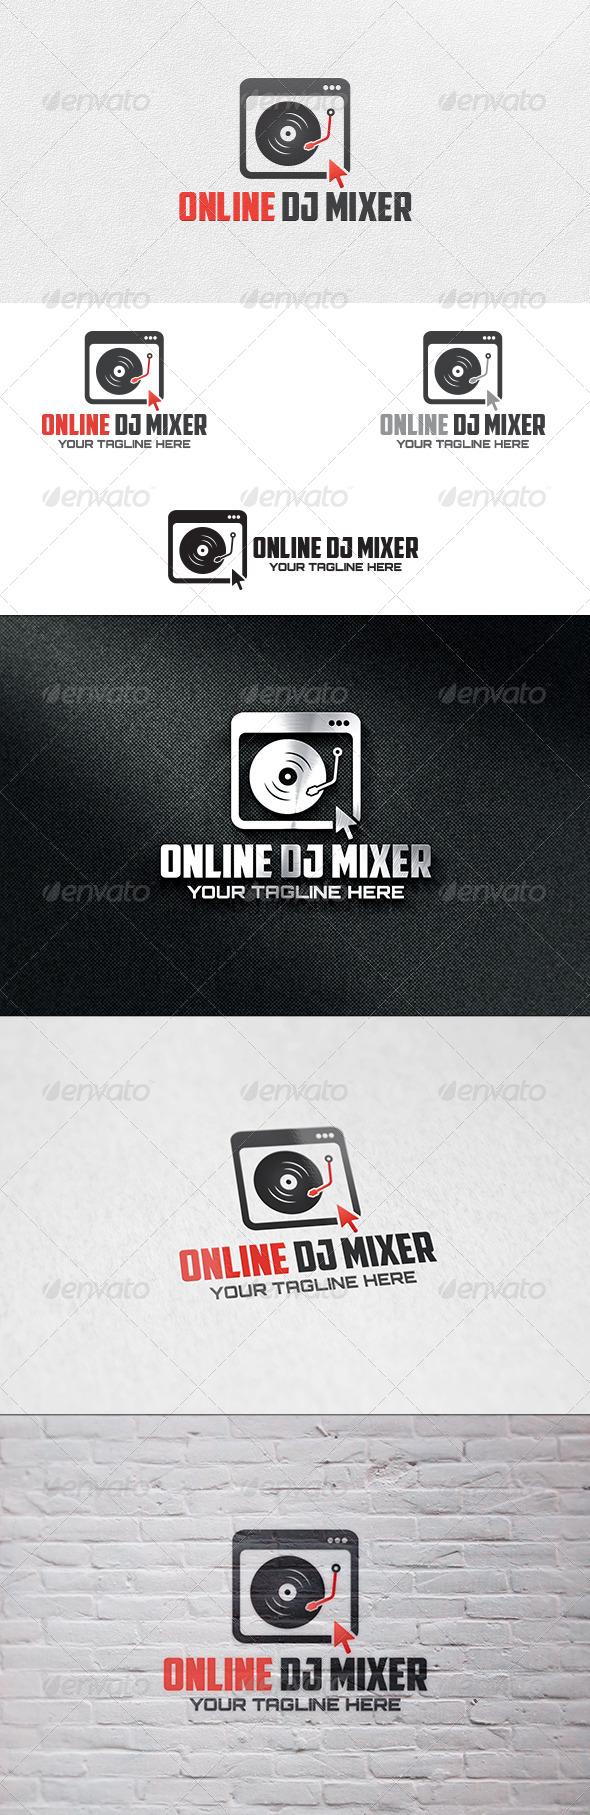 GraphicRiver Online DJ Mixer Logo Template 6776360